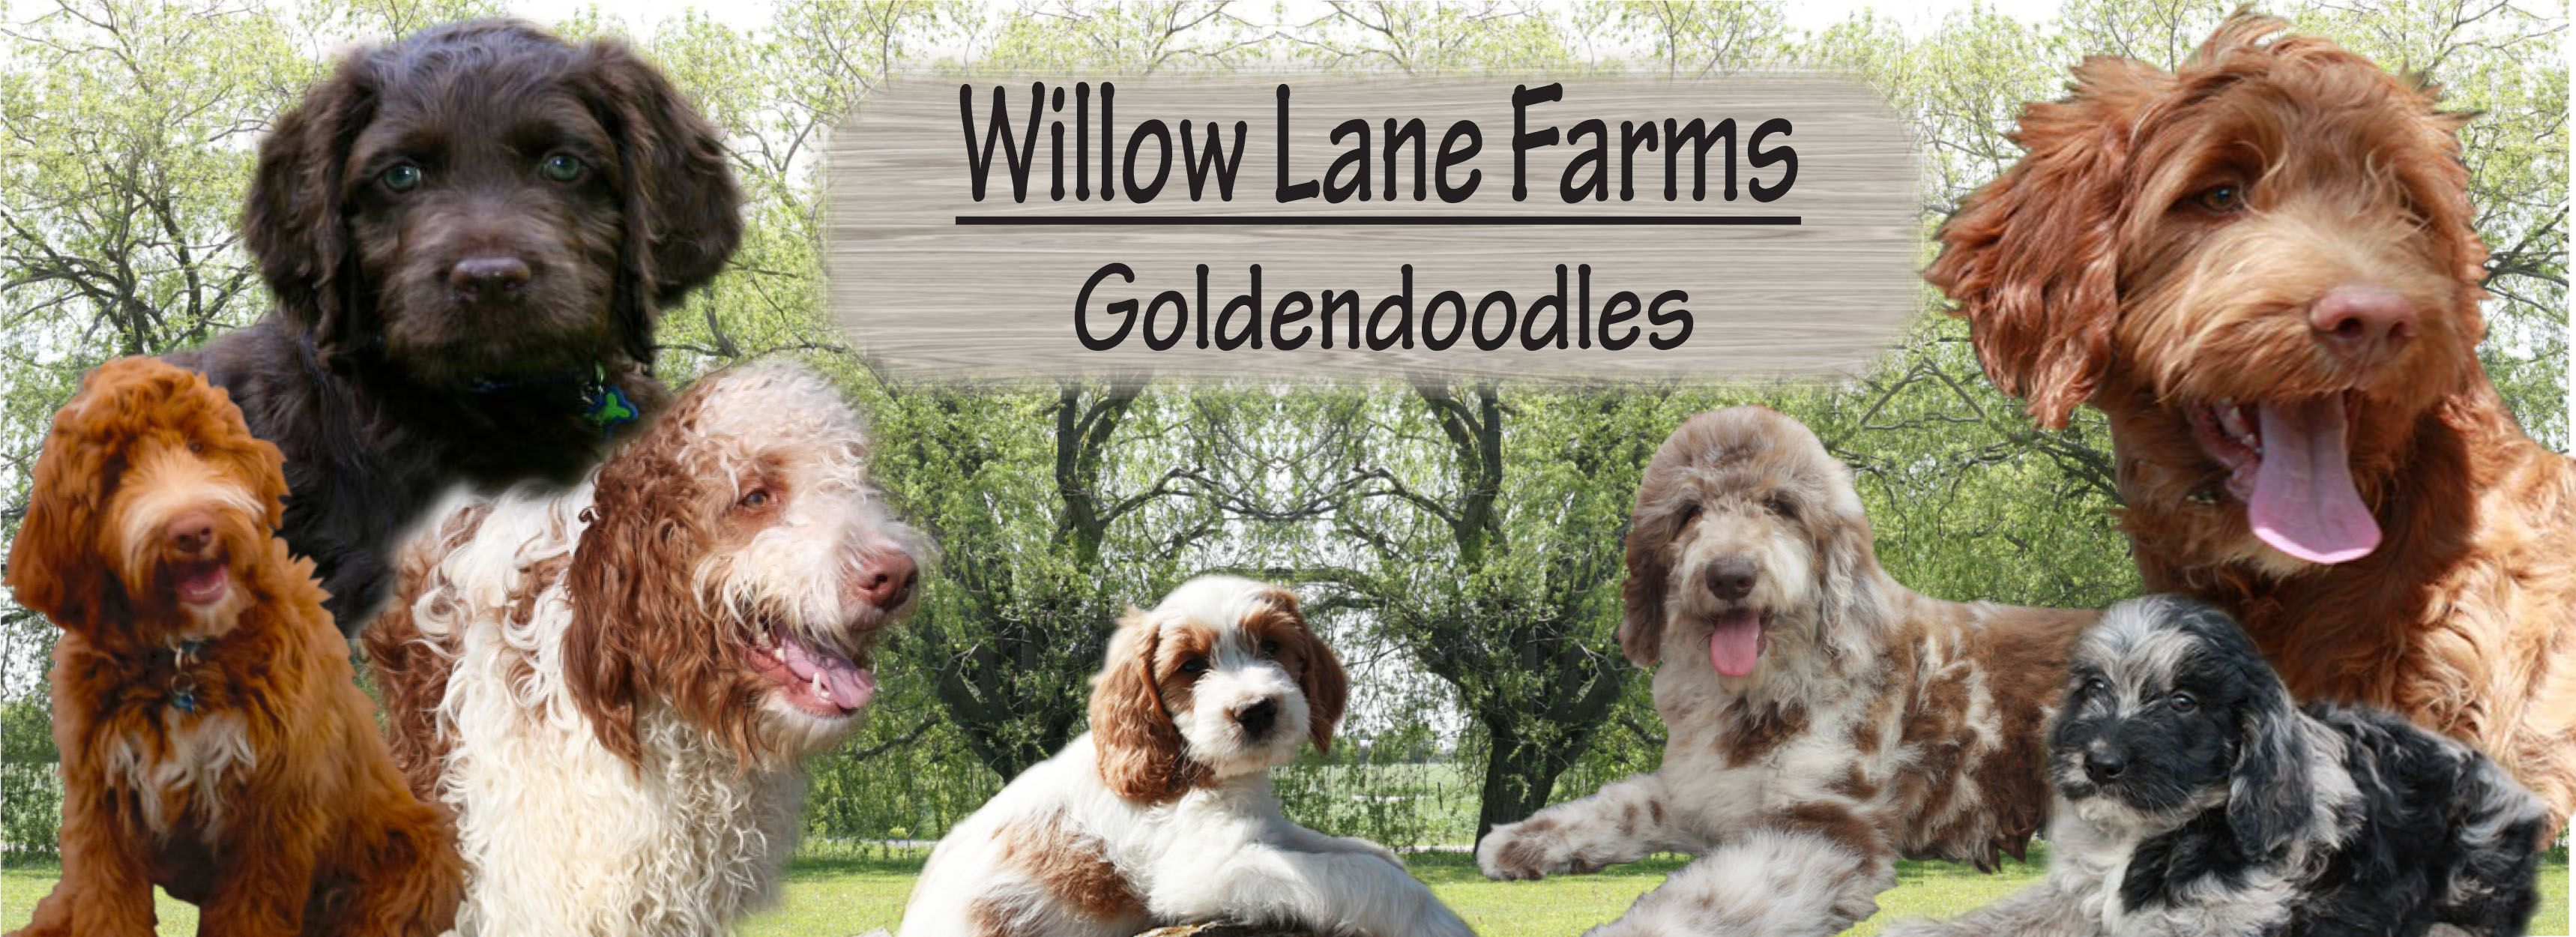 Standard Poodle Breeders Canada Goldendoodle Bernadoodle Puppy